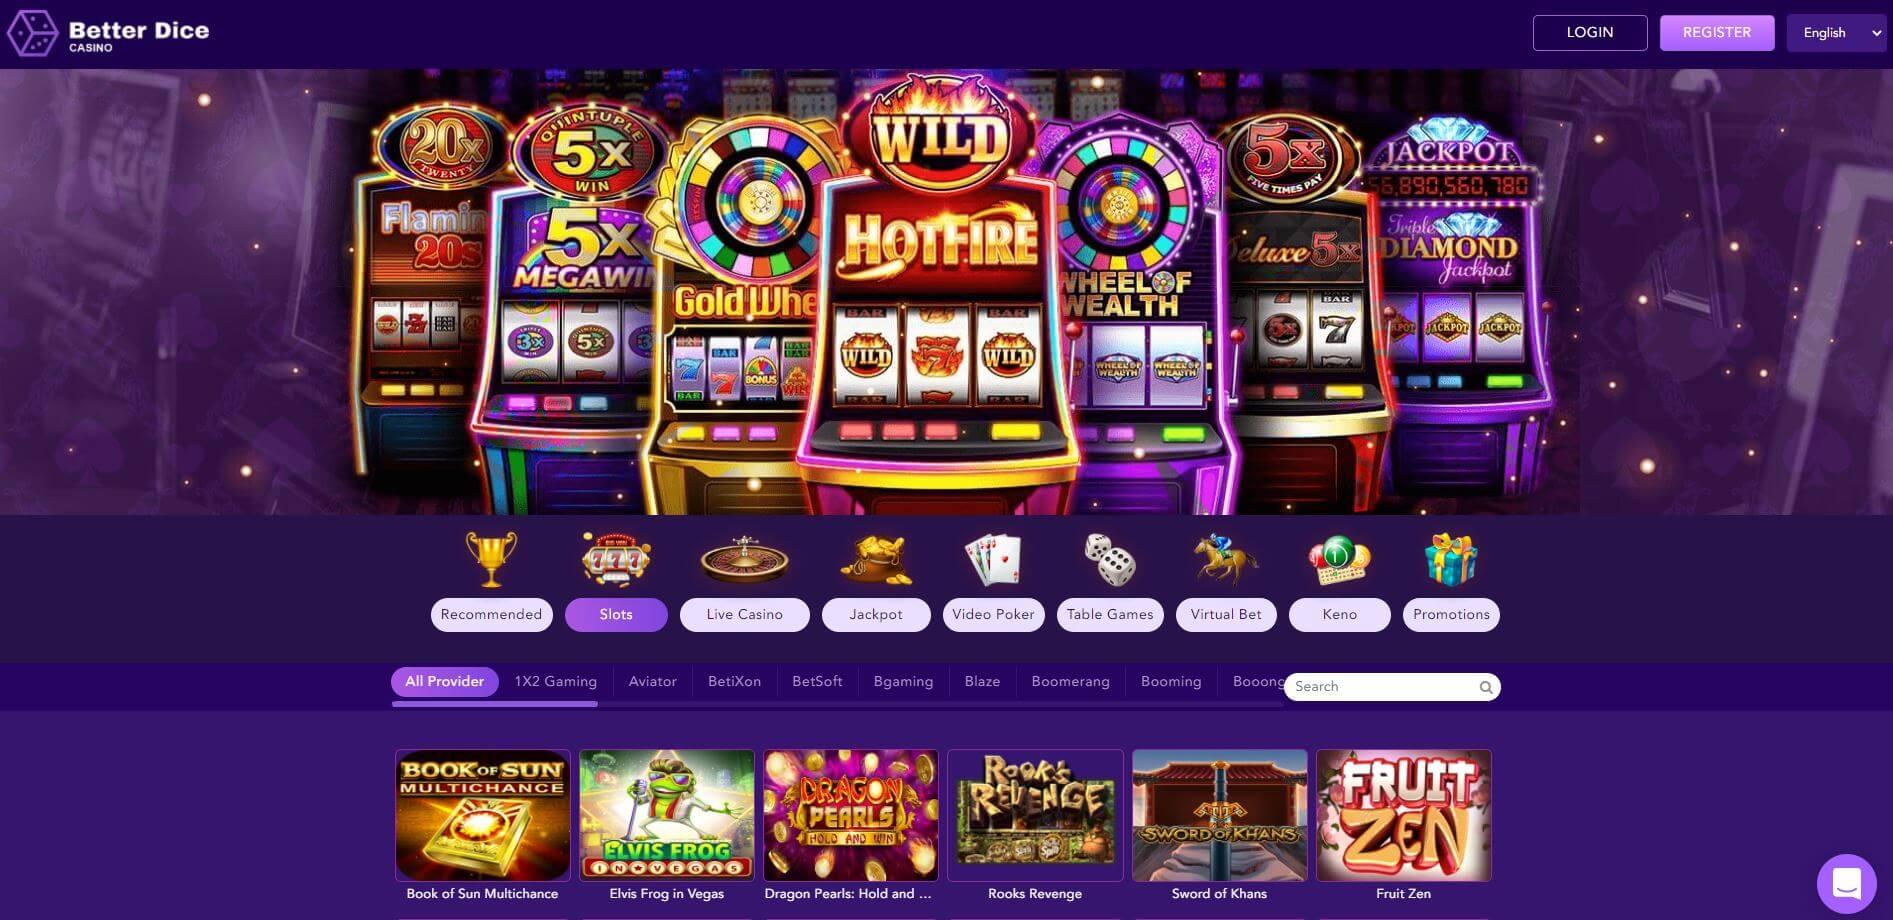 BetterDice Casino Slots